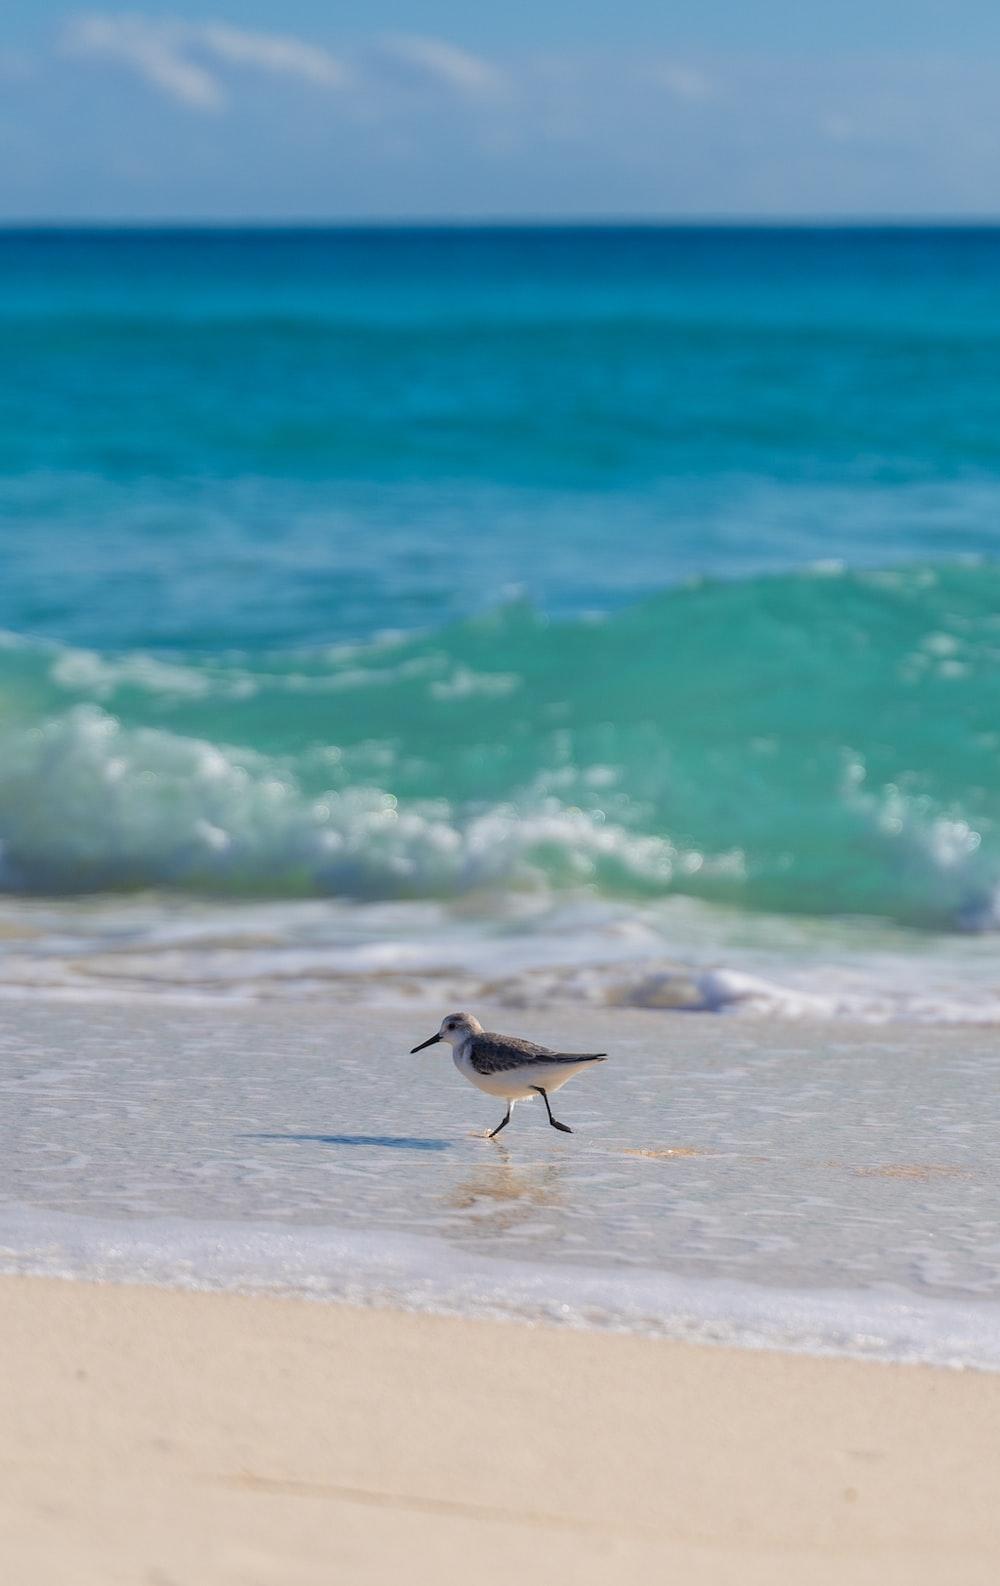 white and black bird on beach during daytime